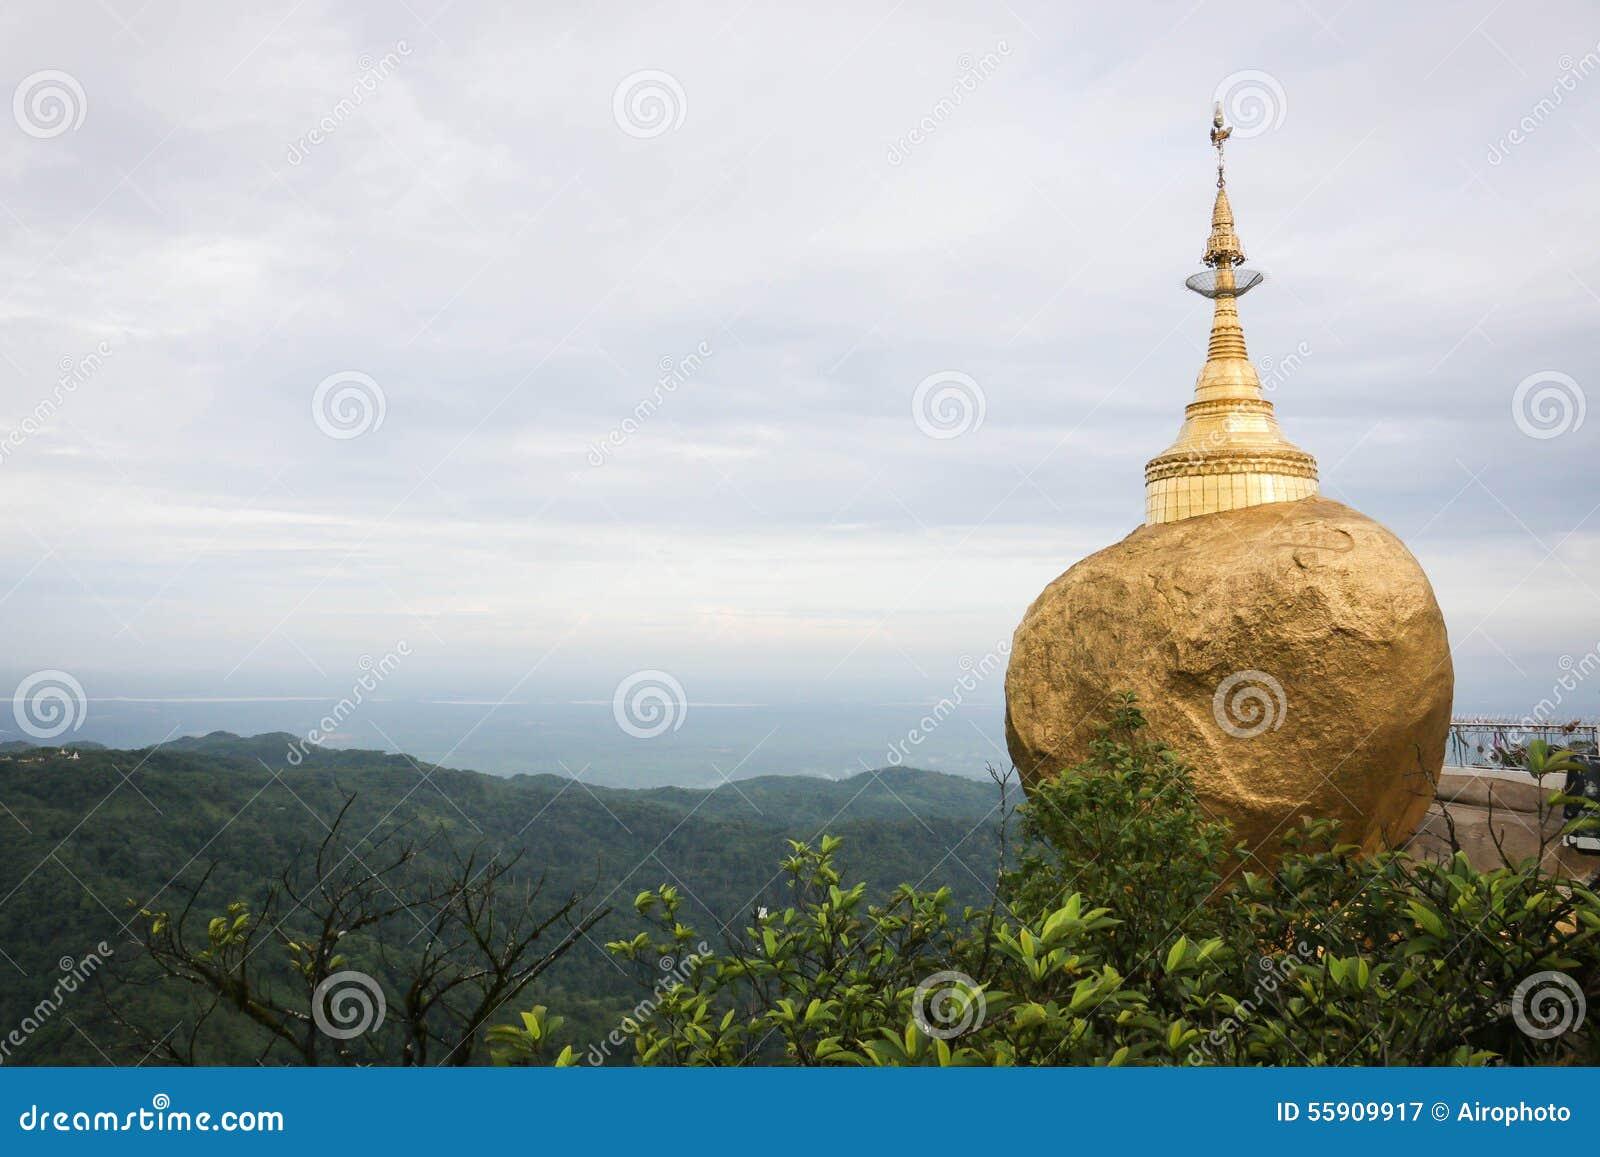 golden rock myanmar how to get there